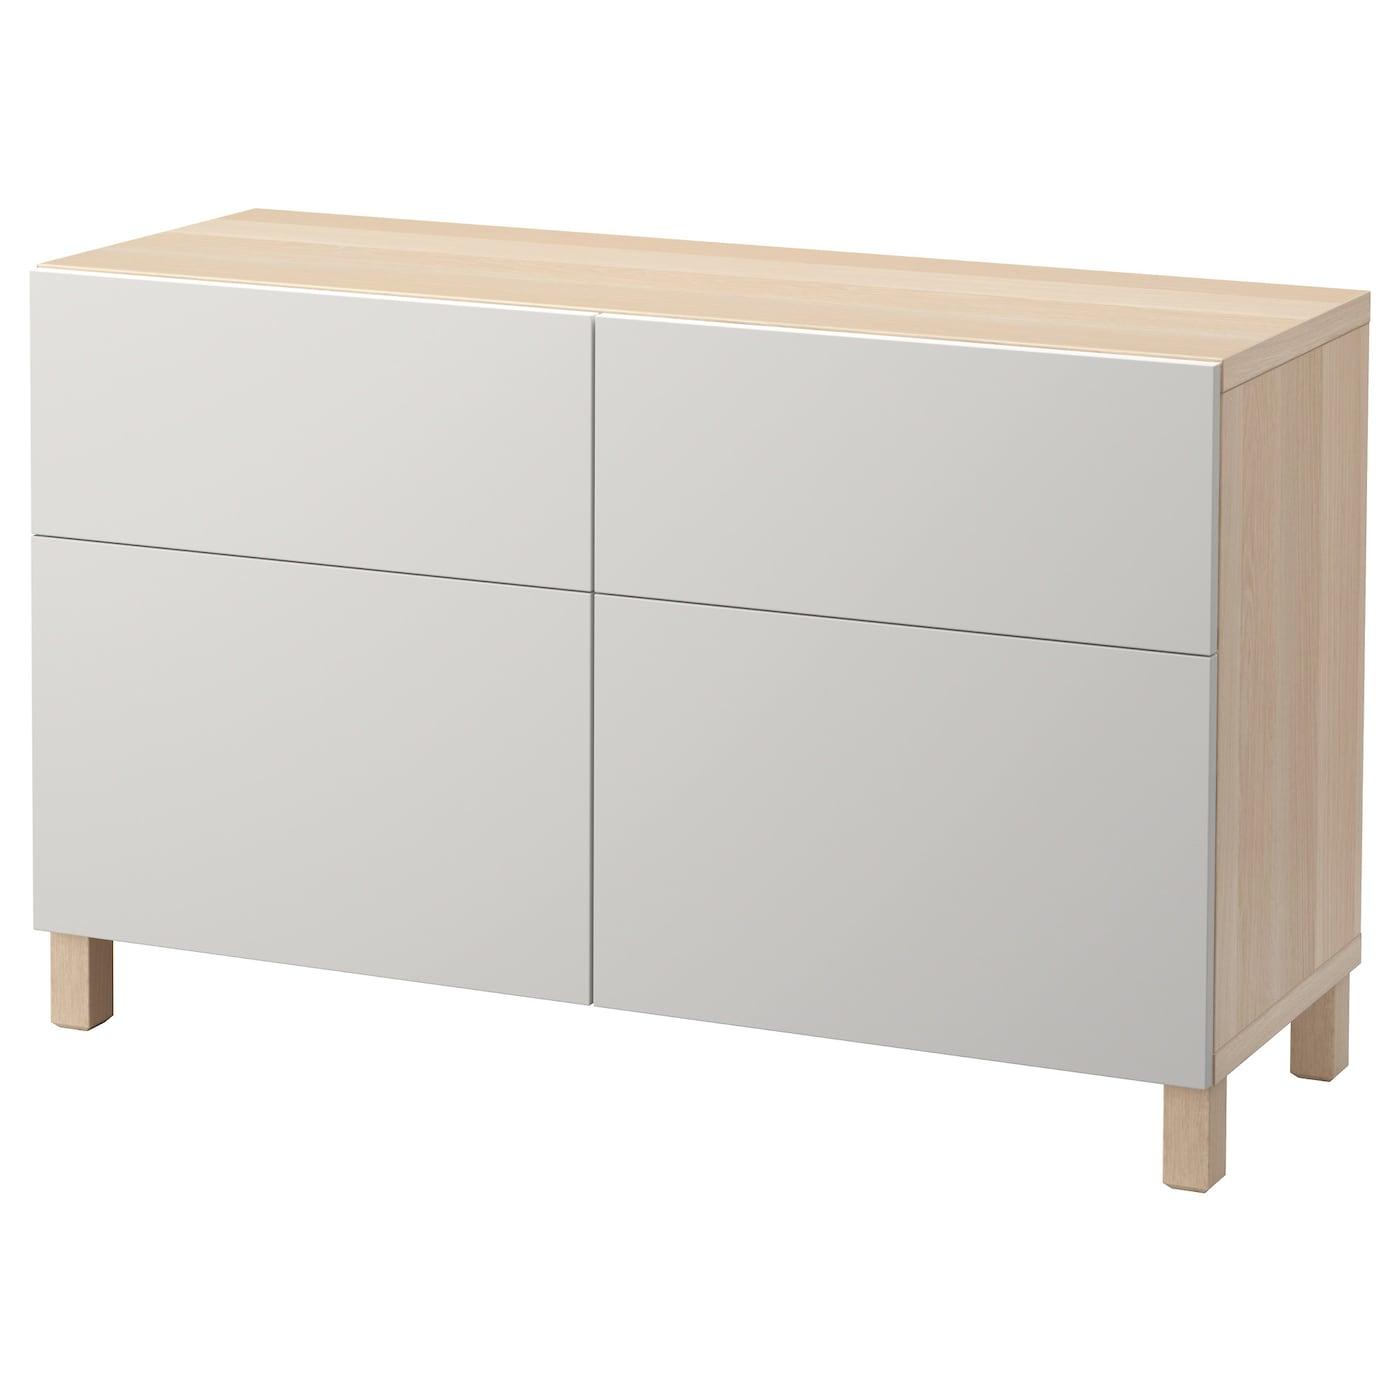 Storage Combination W Doors Drawers Besta White Stained Oak Effect Lappviken Light Grey